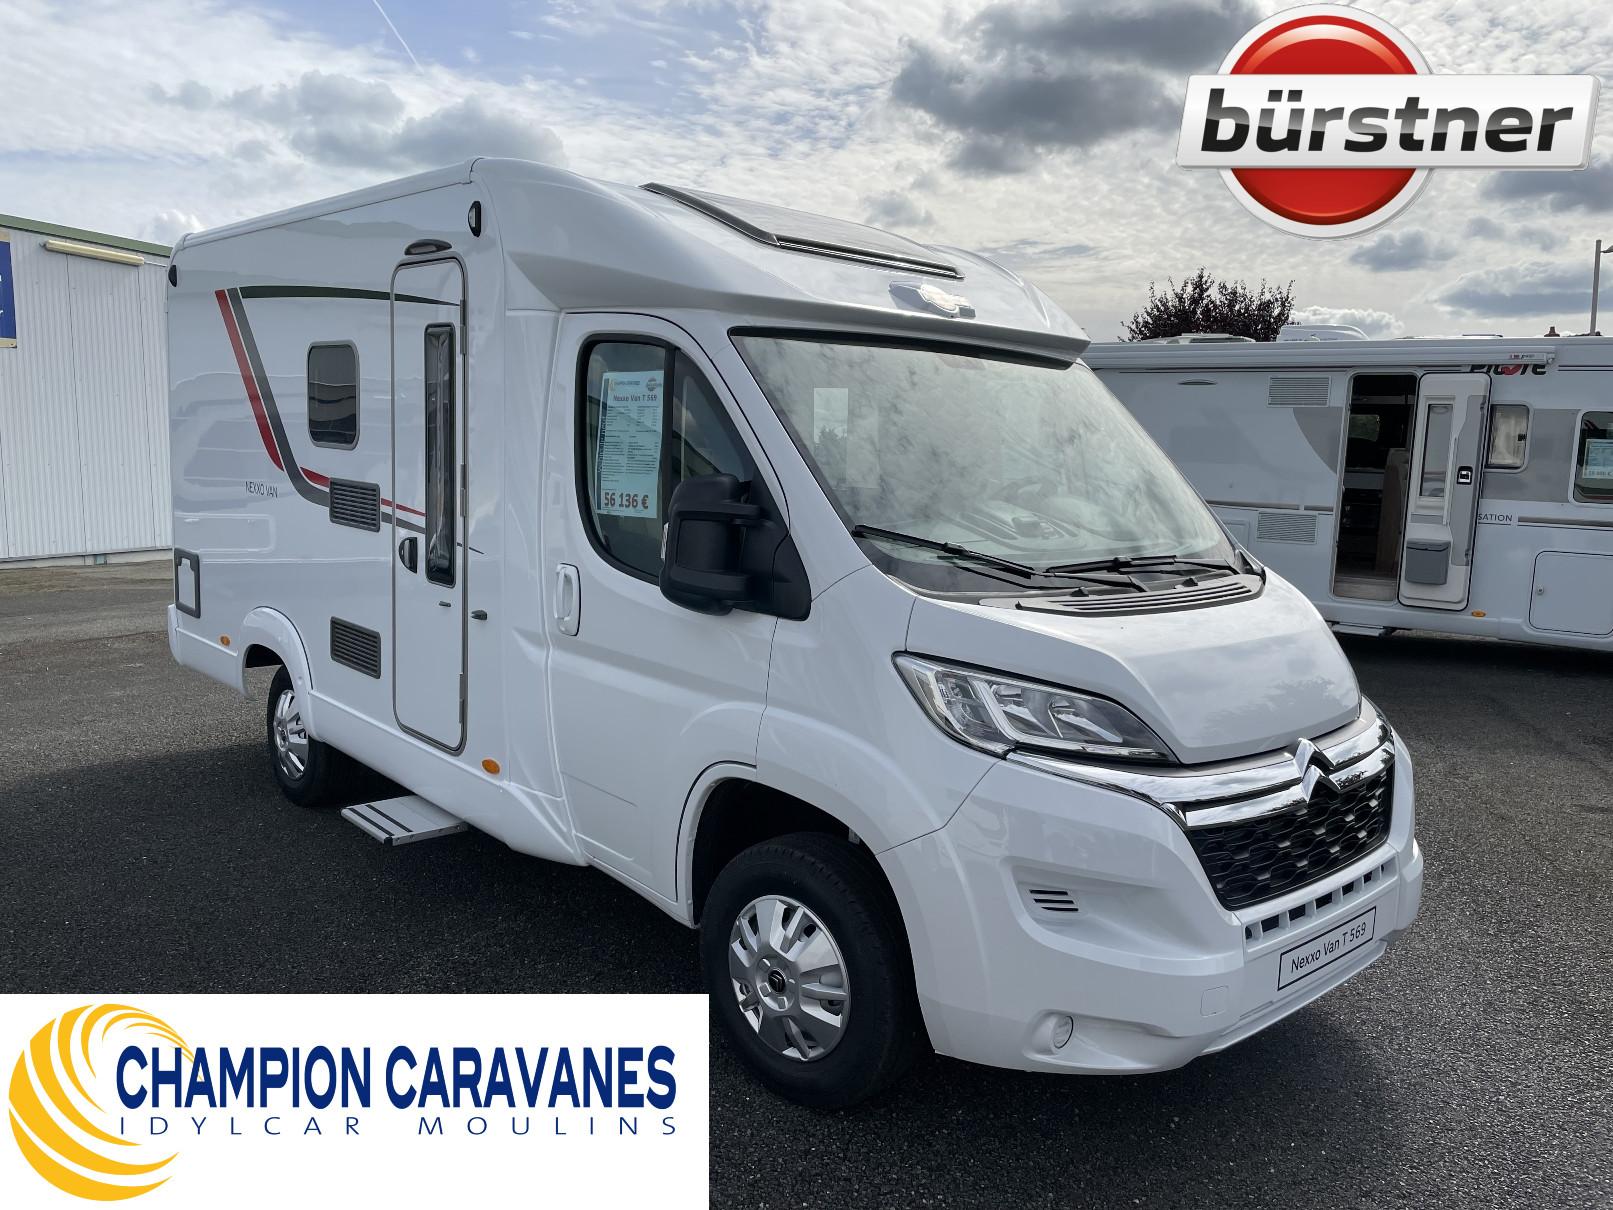 Camping-car BÜRSTNER Nexxo Van T 569